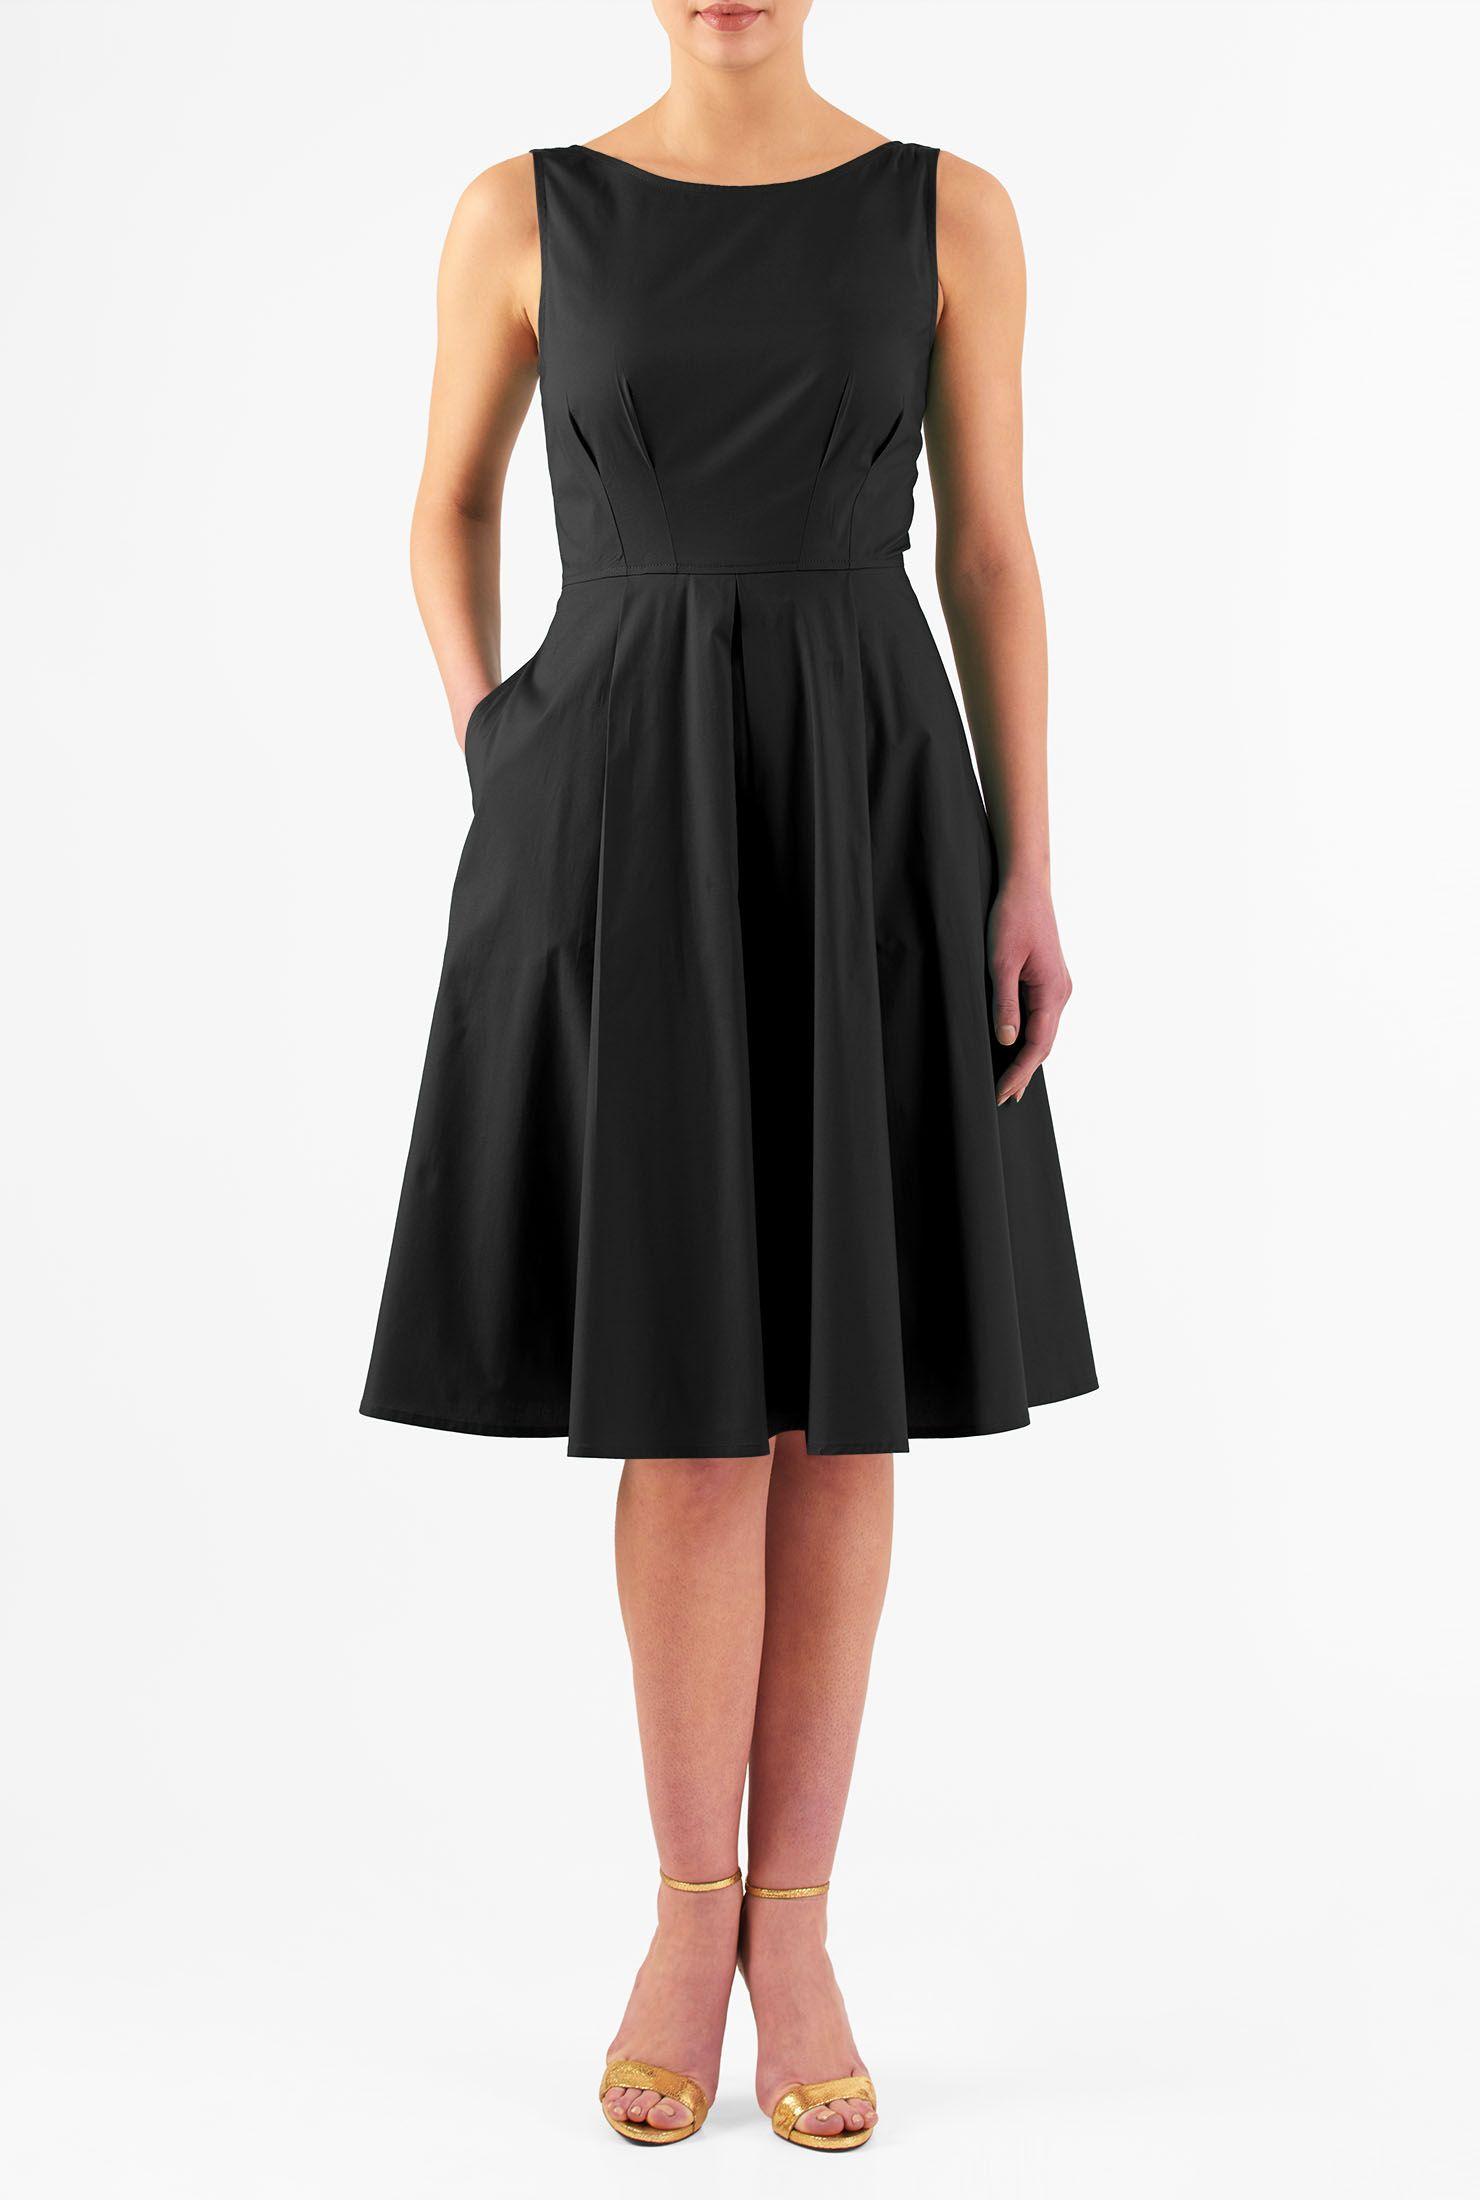 Aurora dress style cl back zip below knee length black